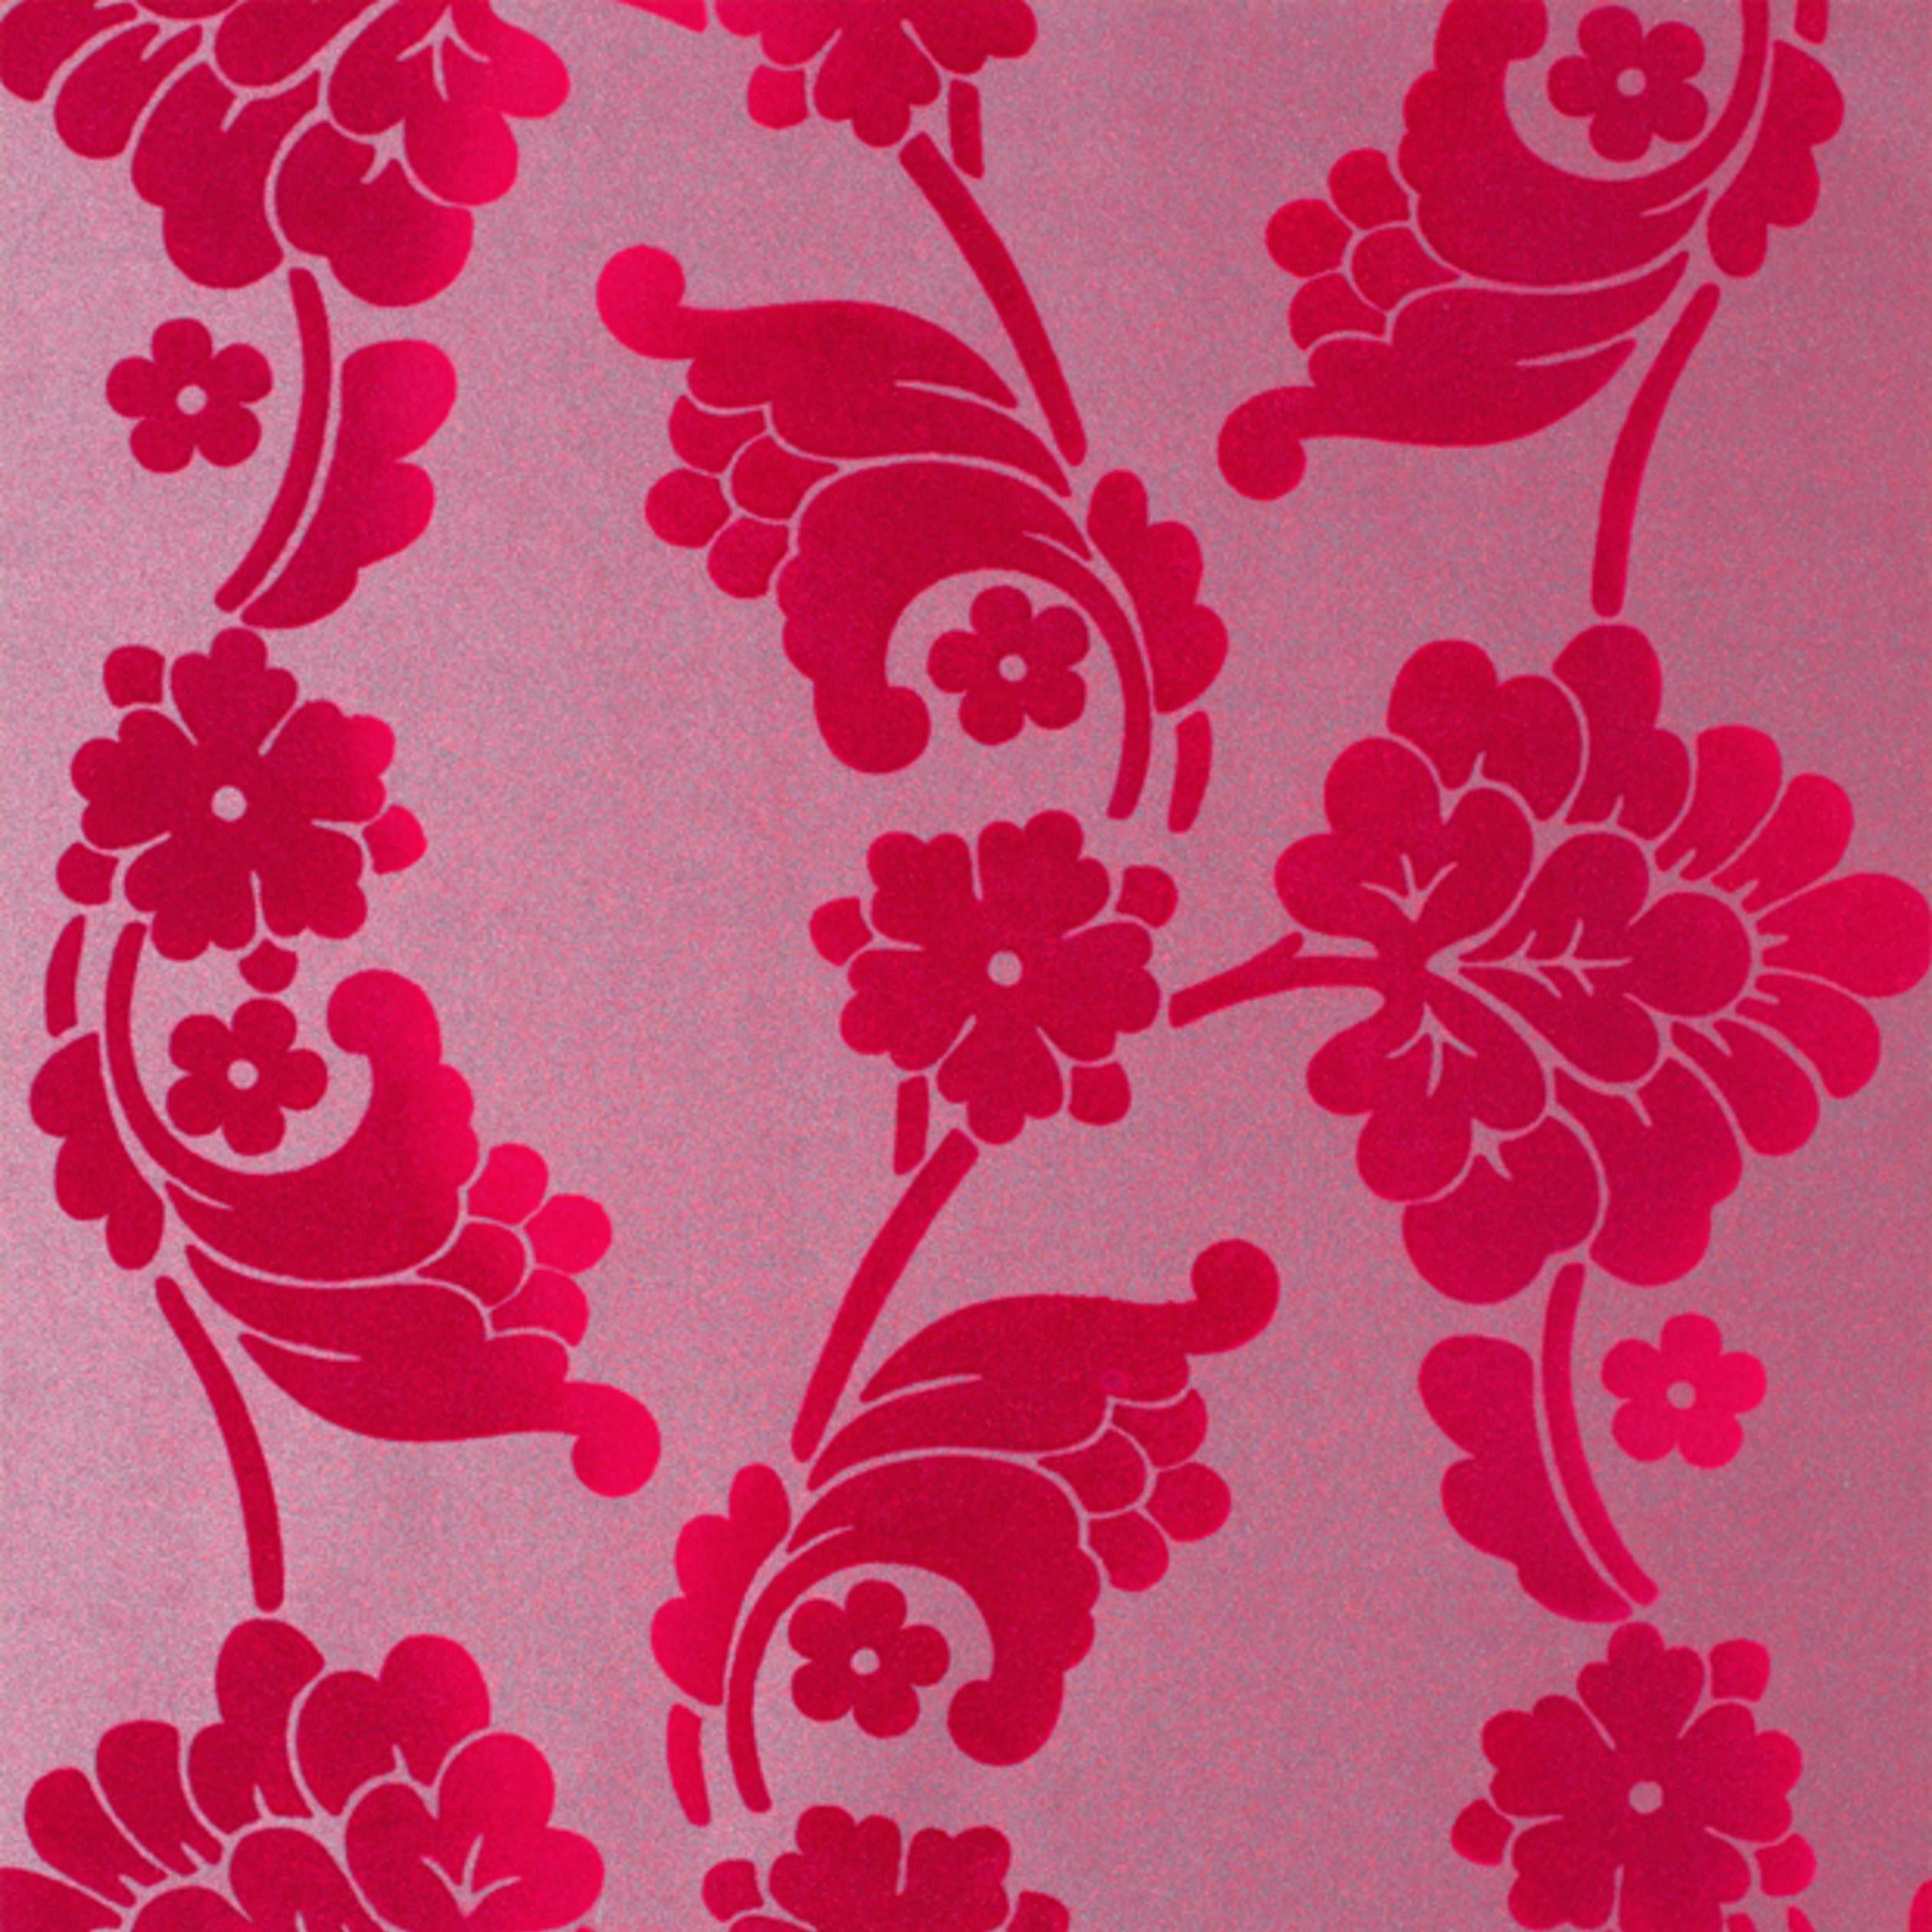 flock wallpaper flock velvet wallpaper flock wallpaper designs - velvet jacquard (flock) wallpaper